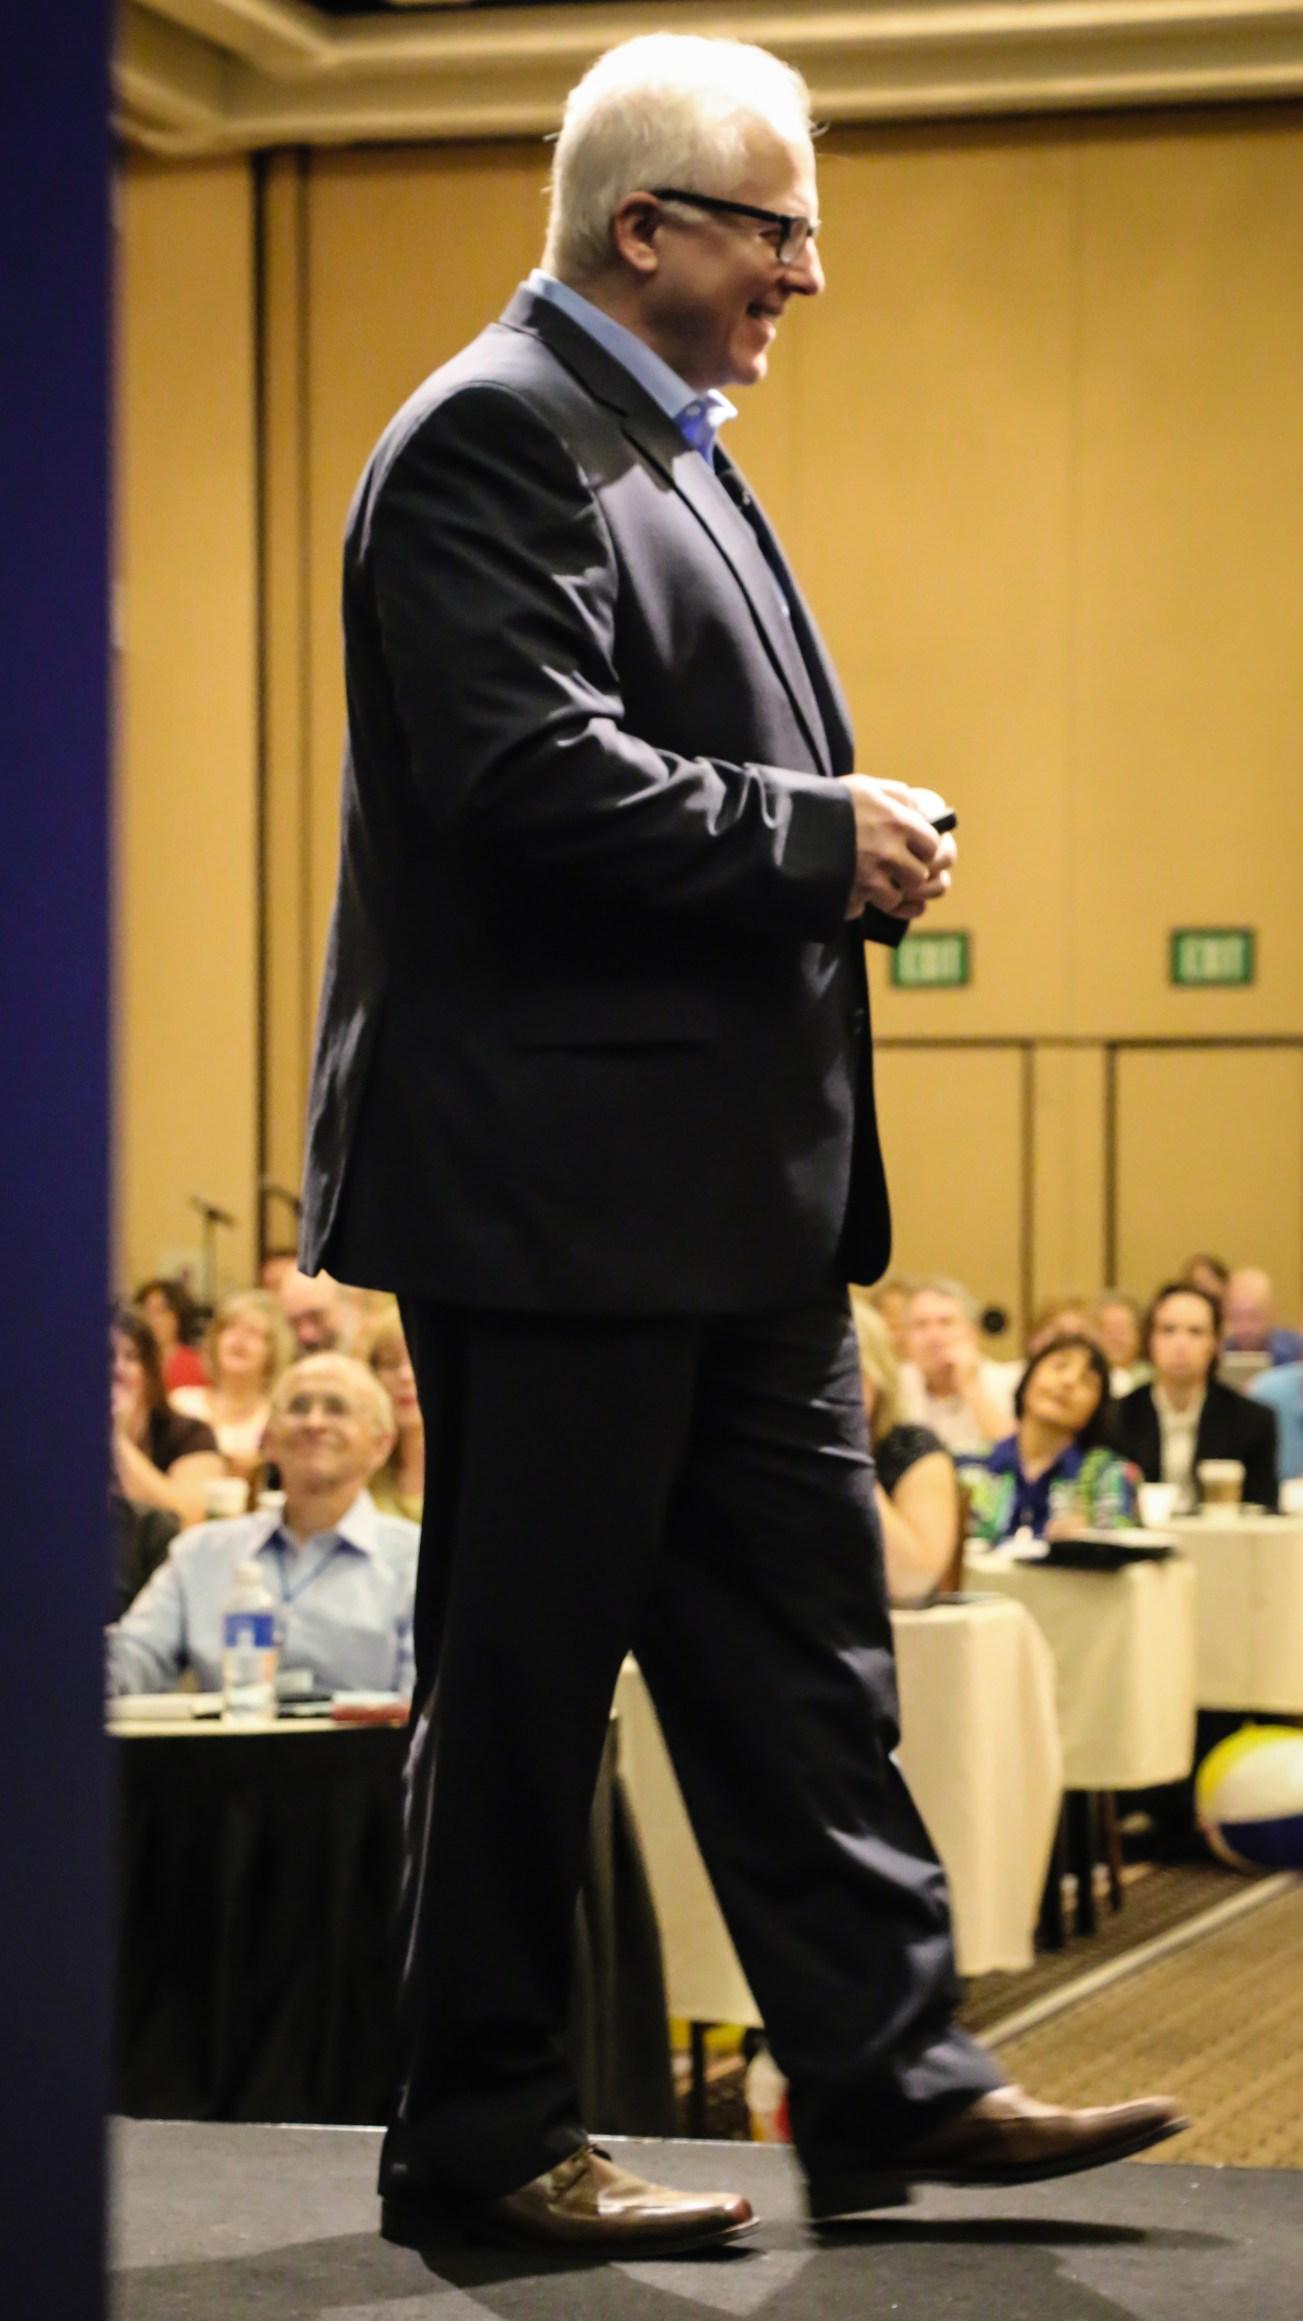 Ford Saeks keynote speaking